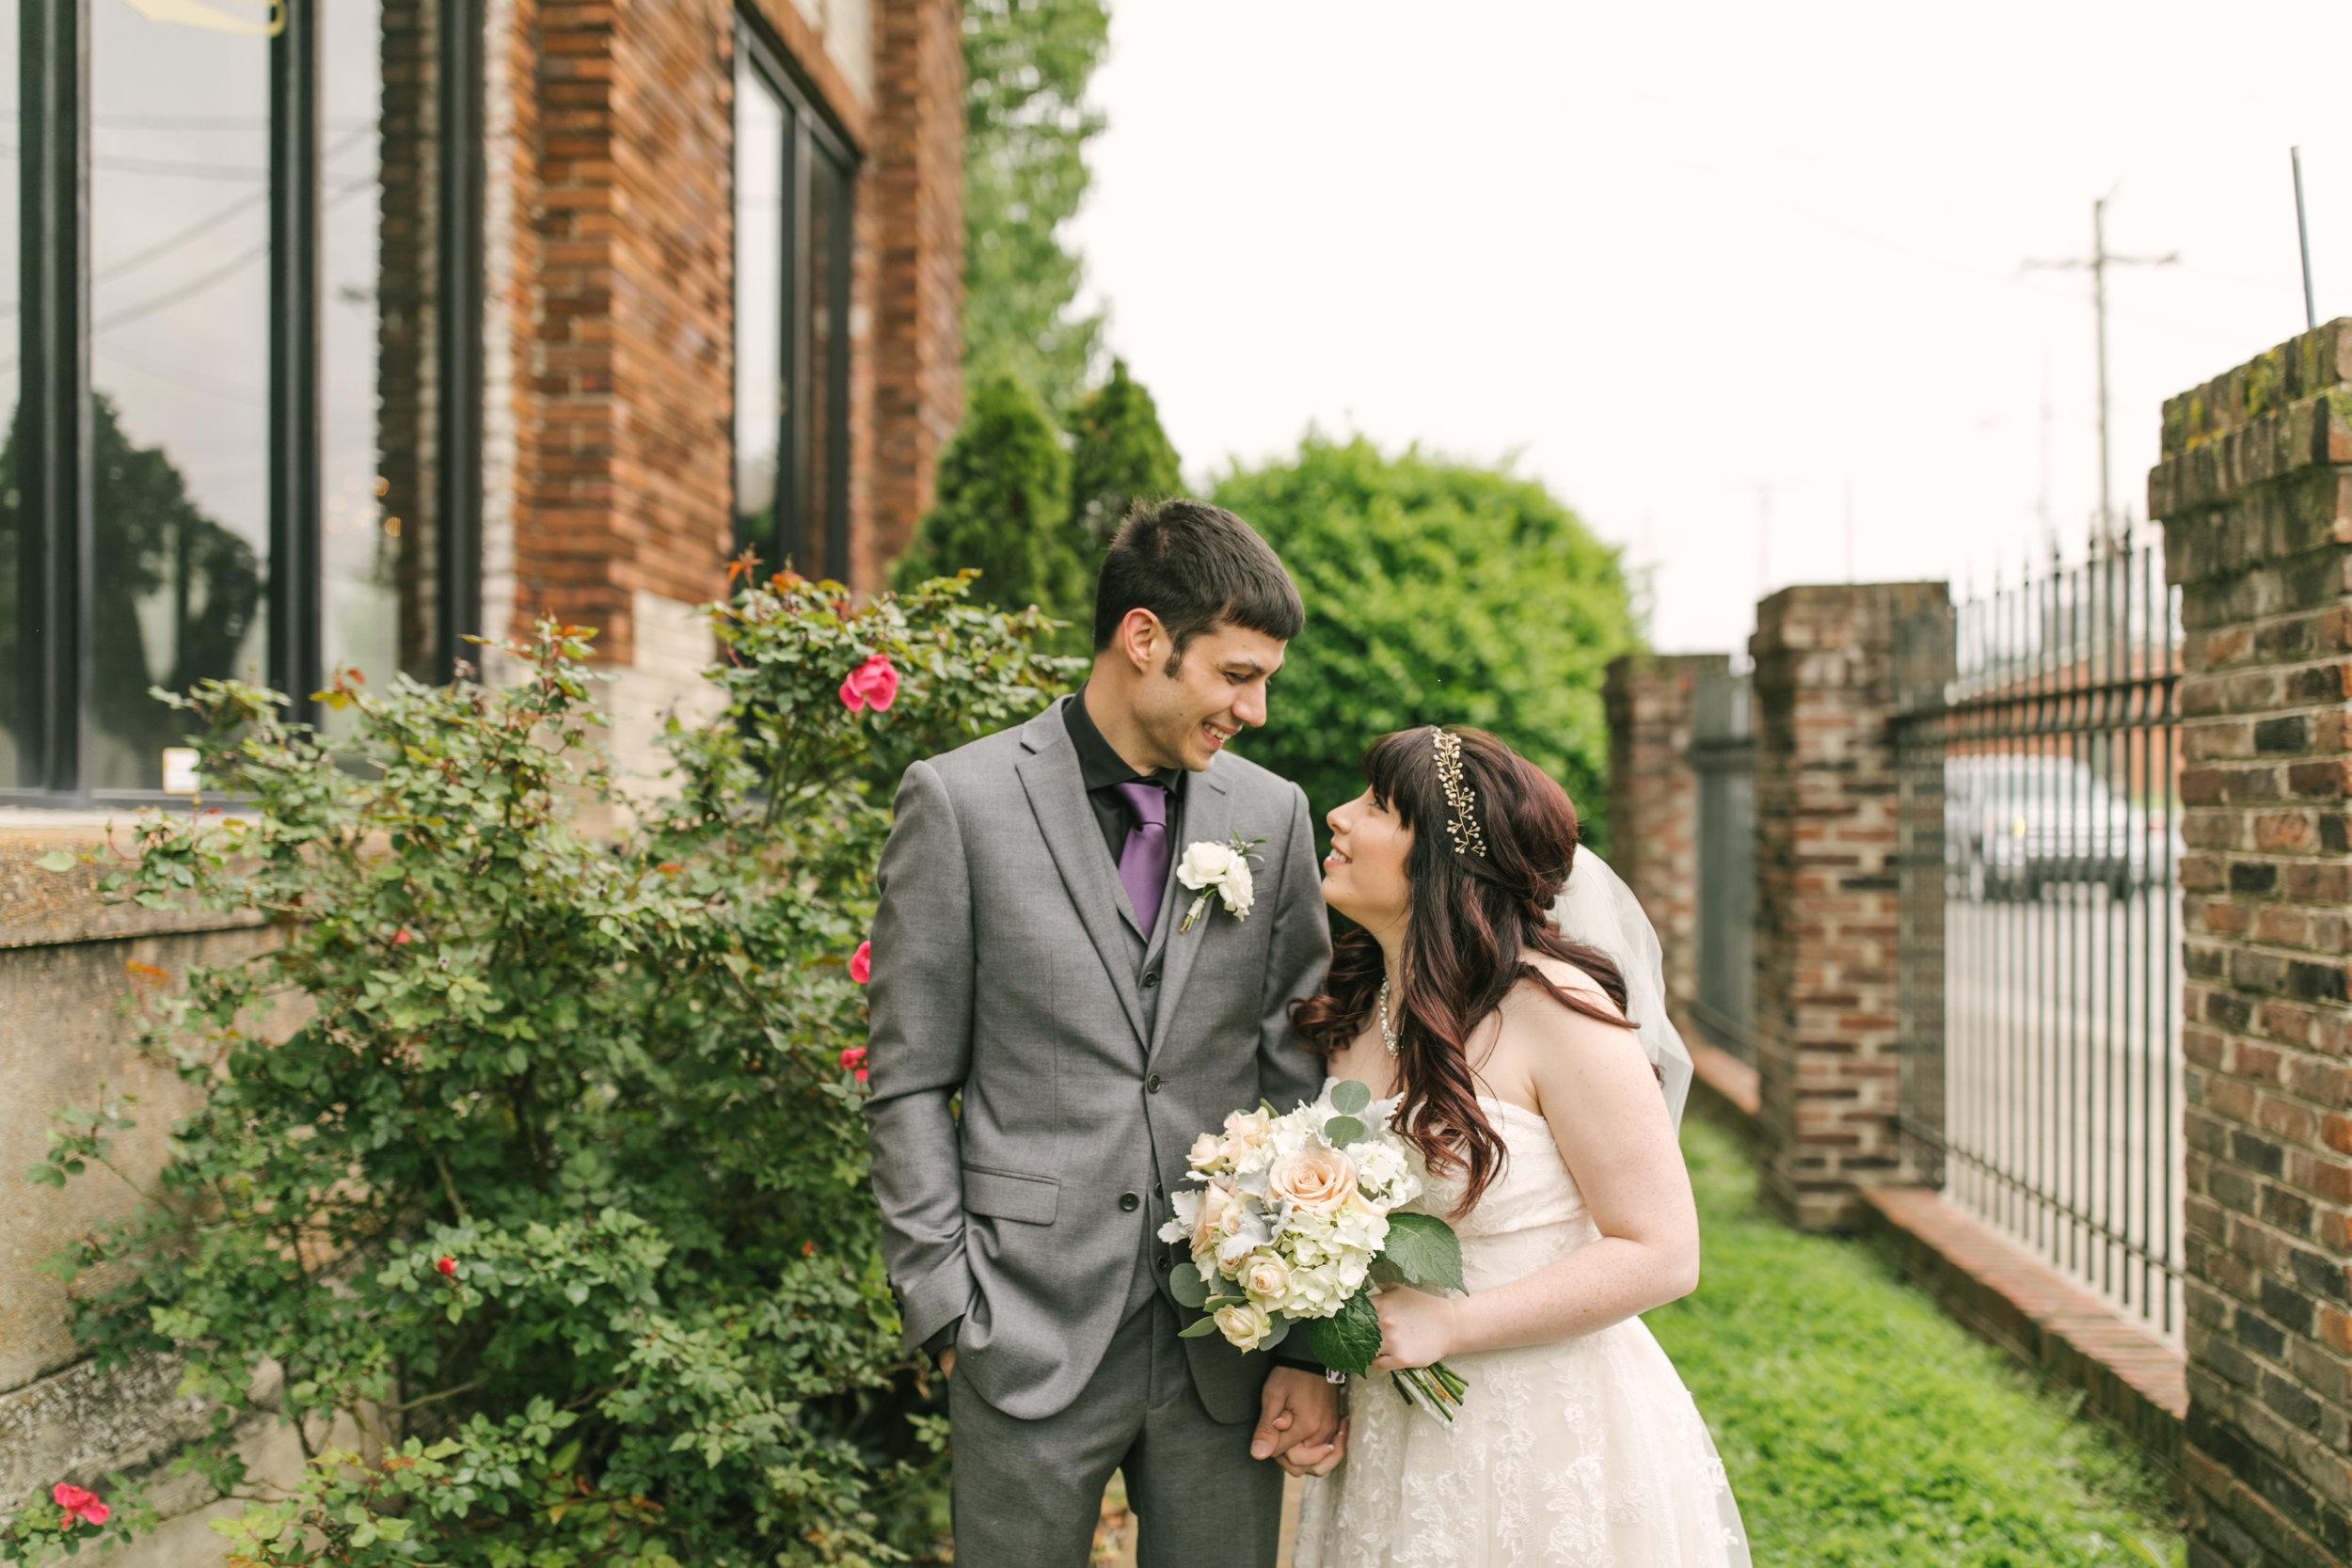 247_Colin+Jessica_Wedding.jpg